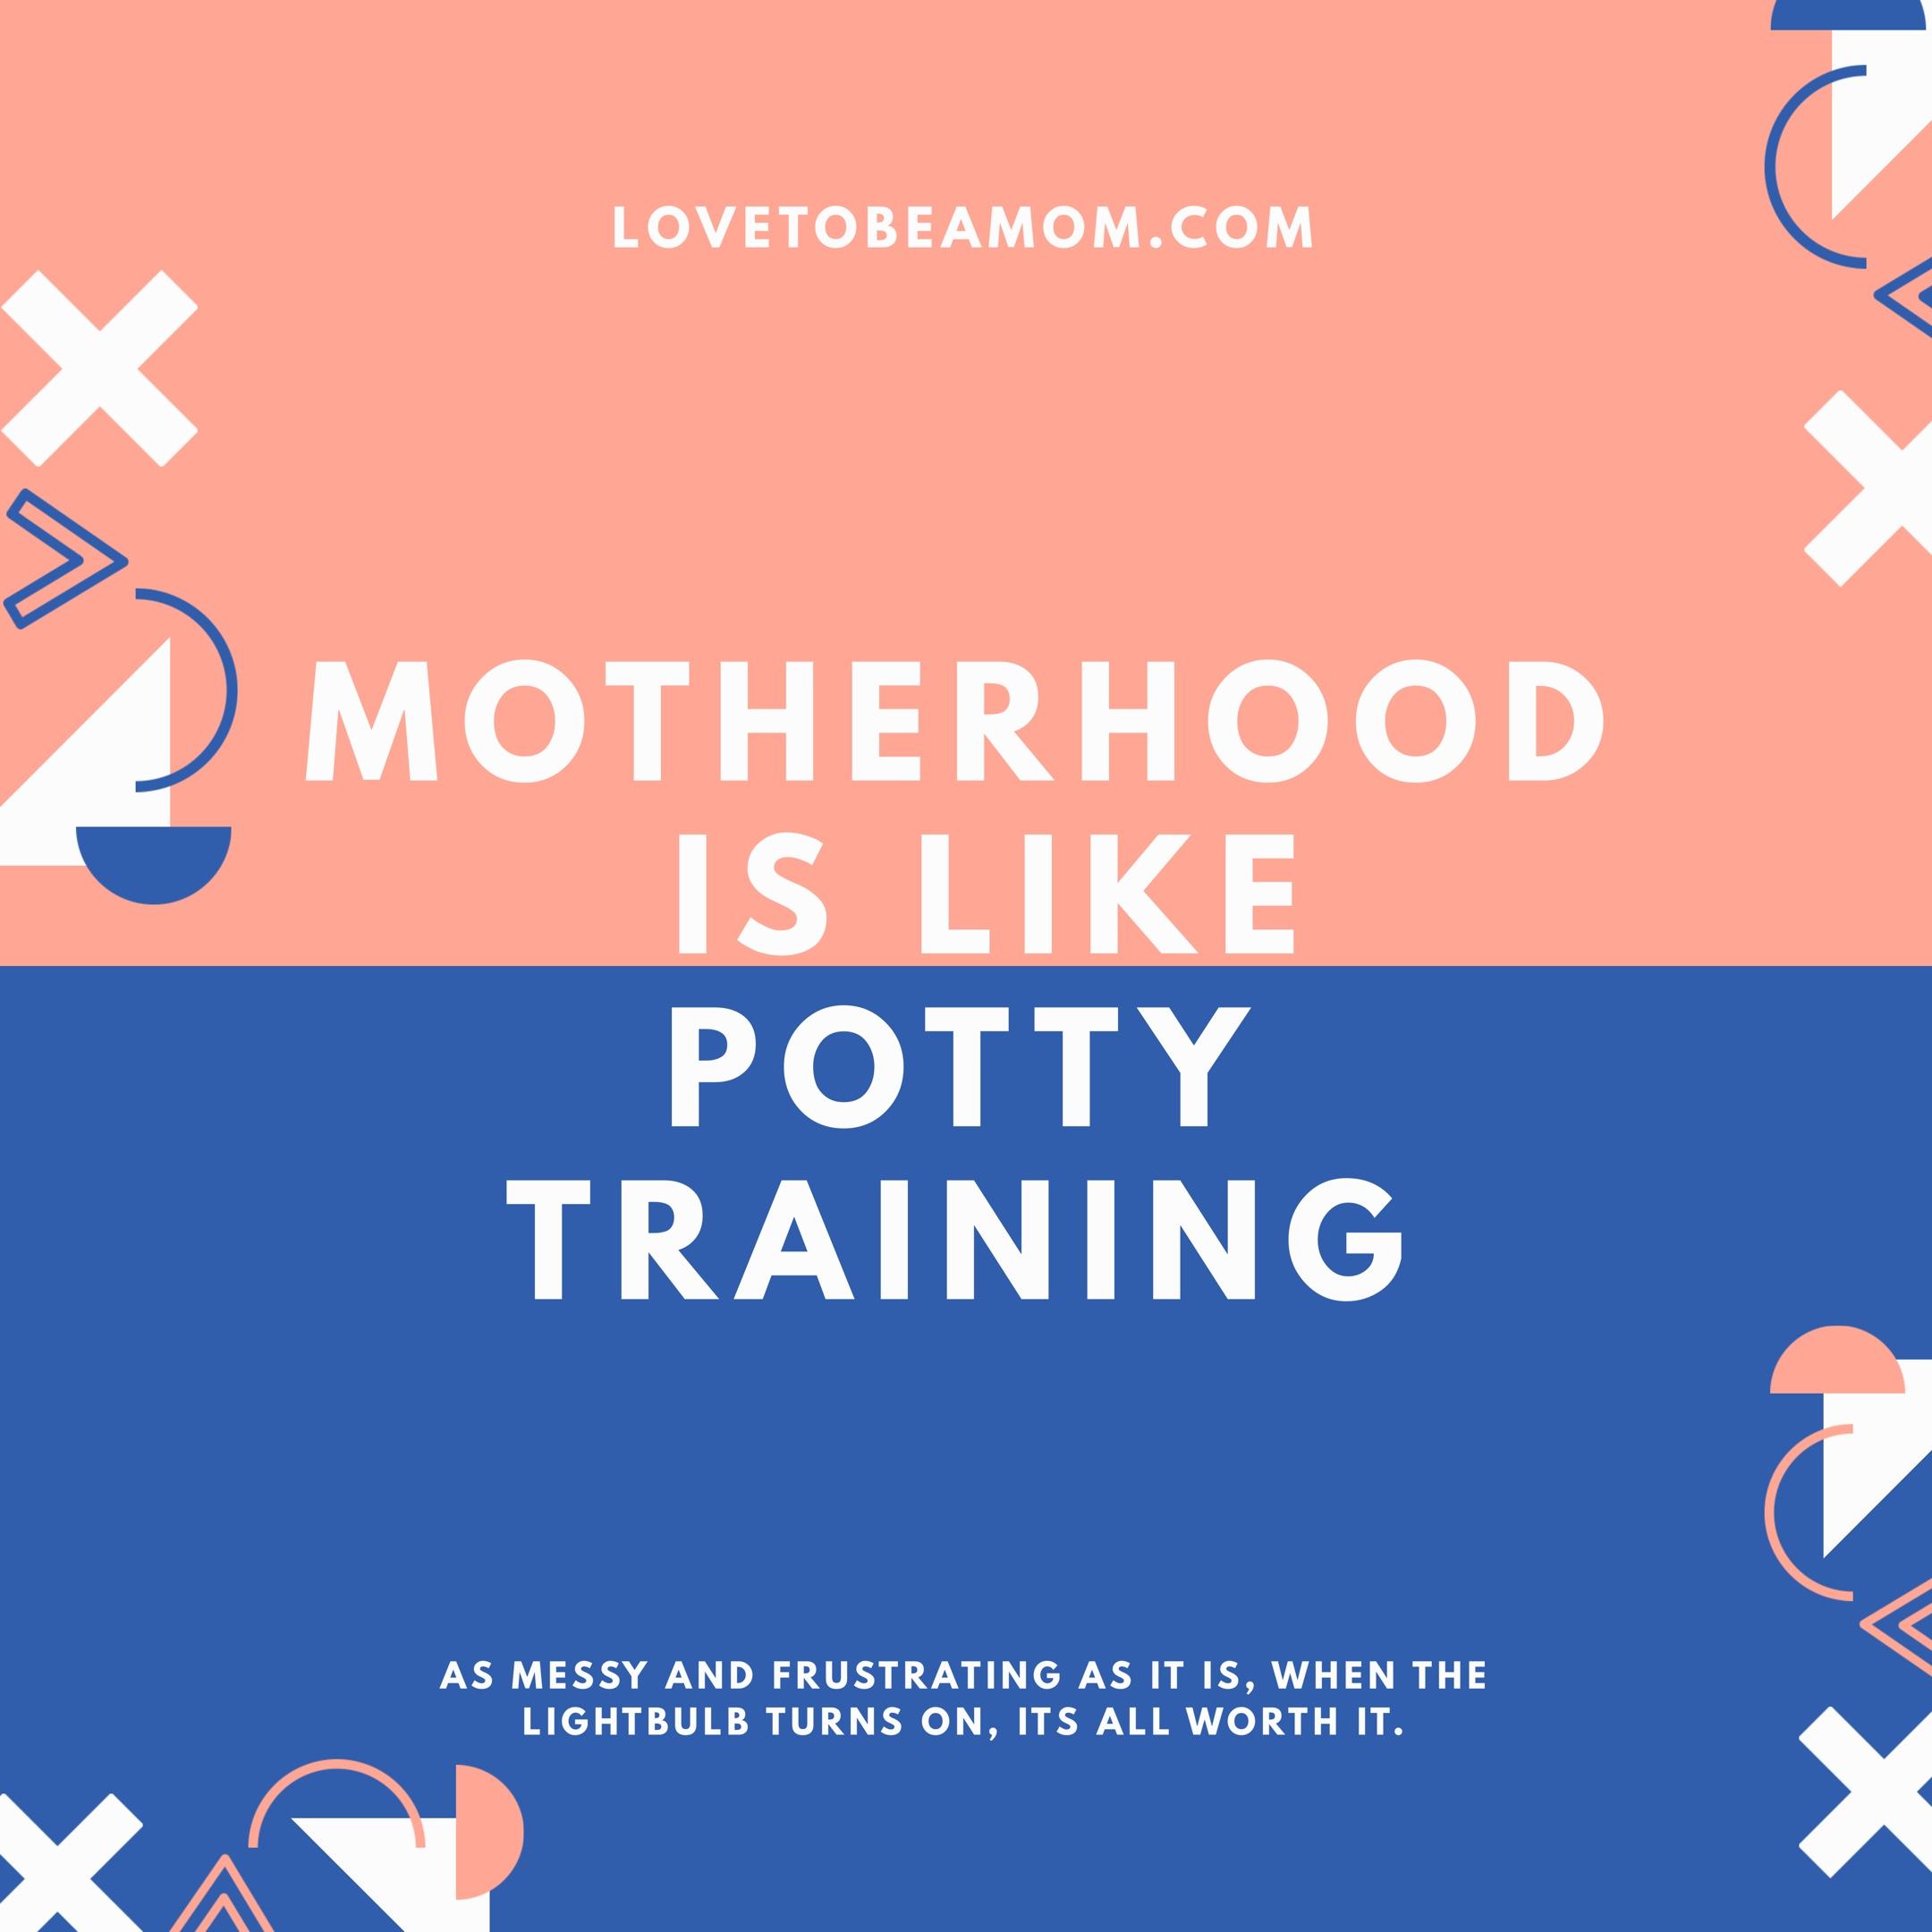 Motherhood is like potty training